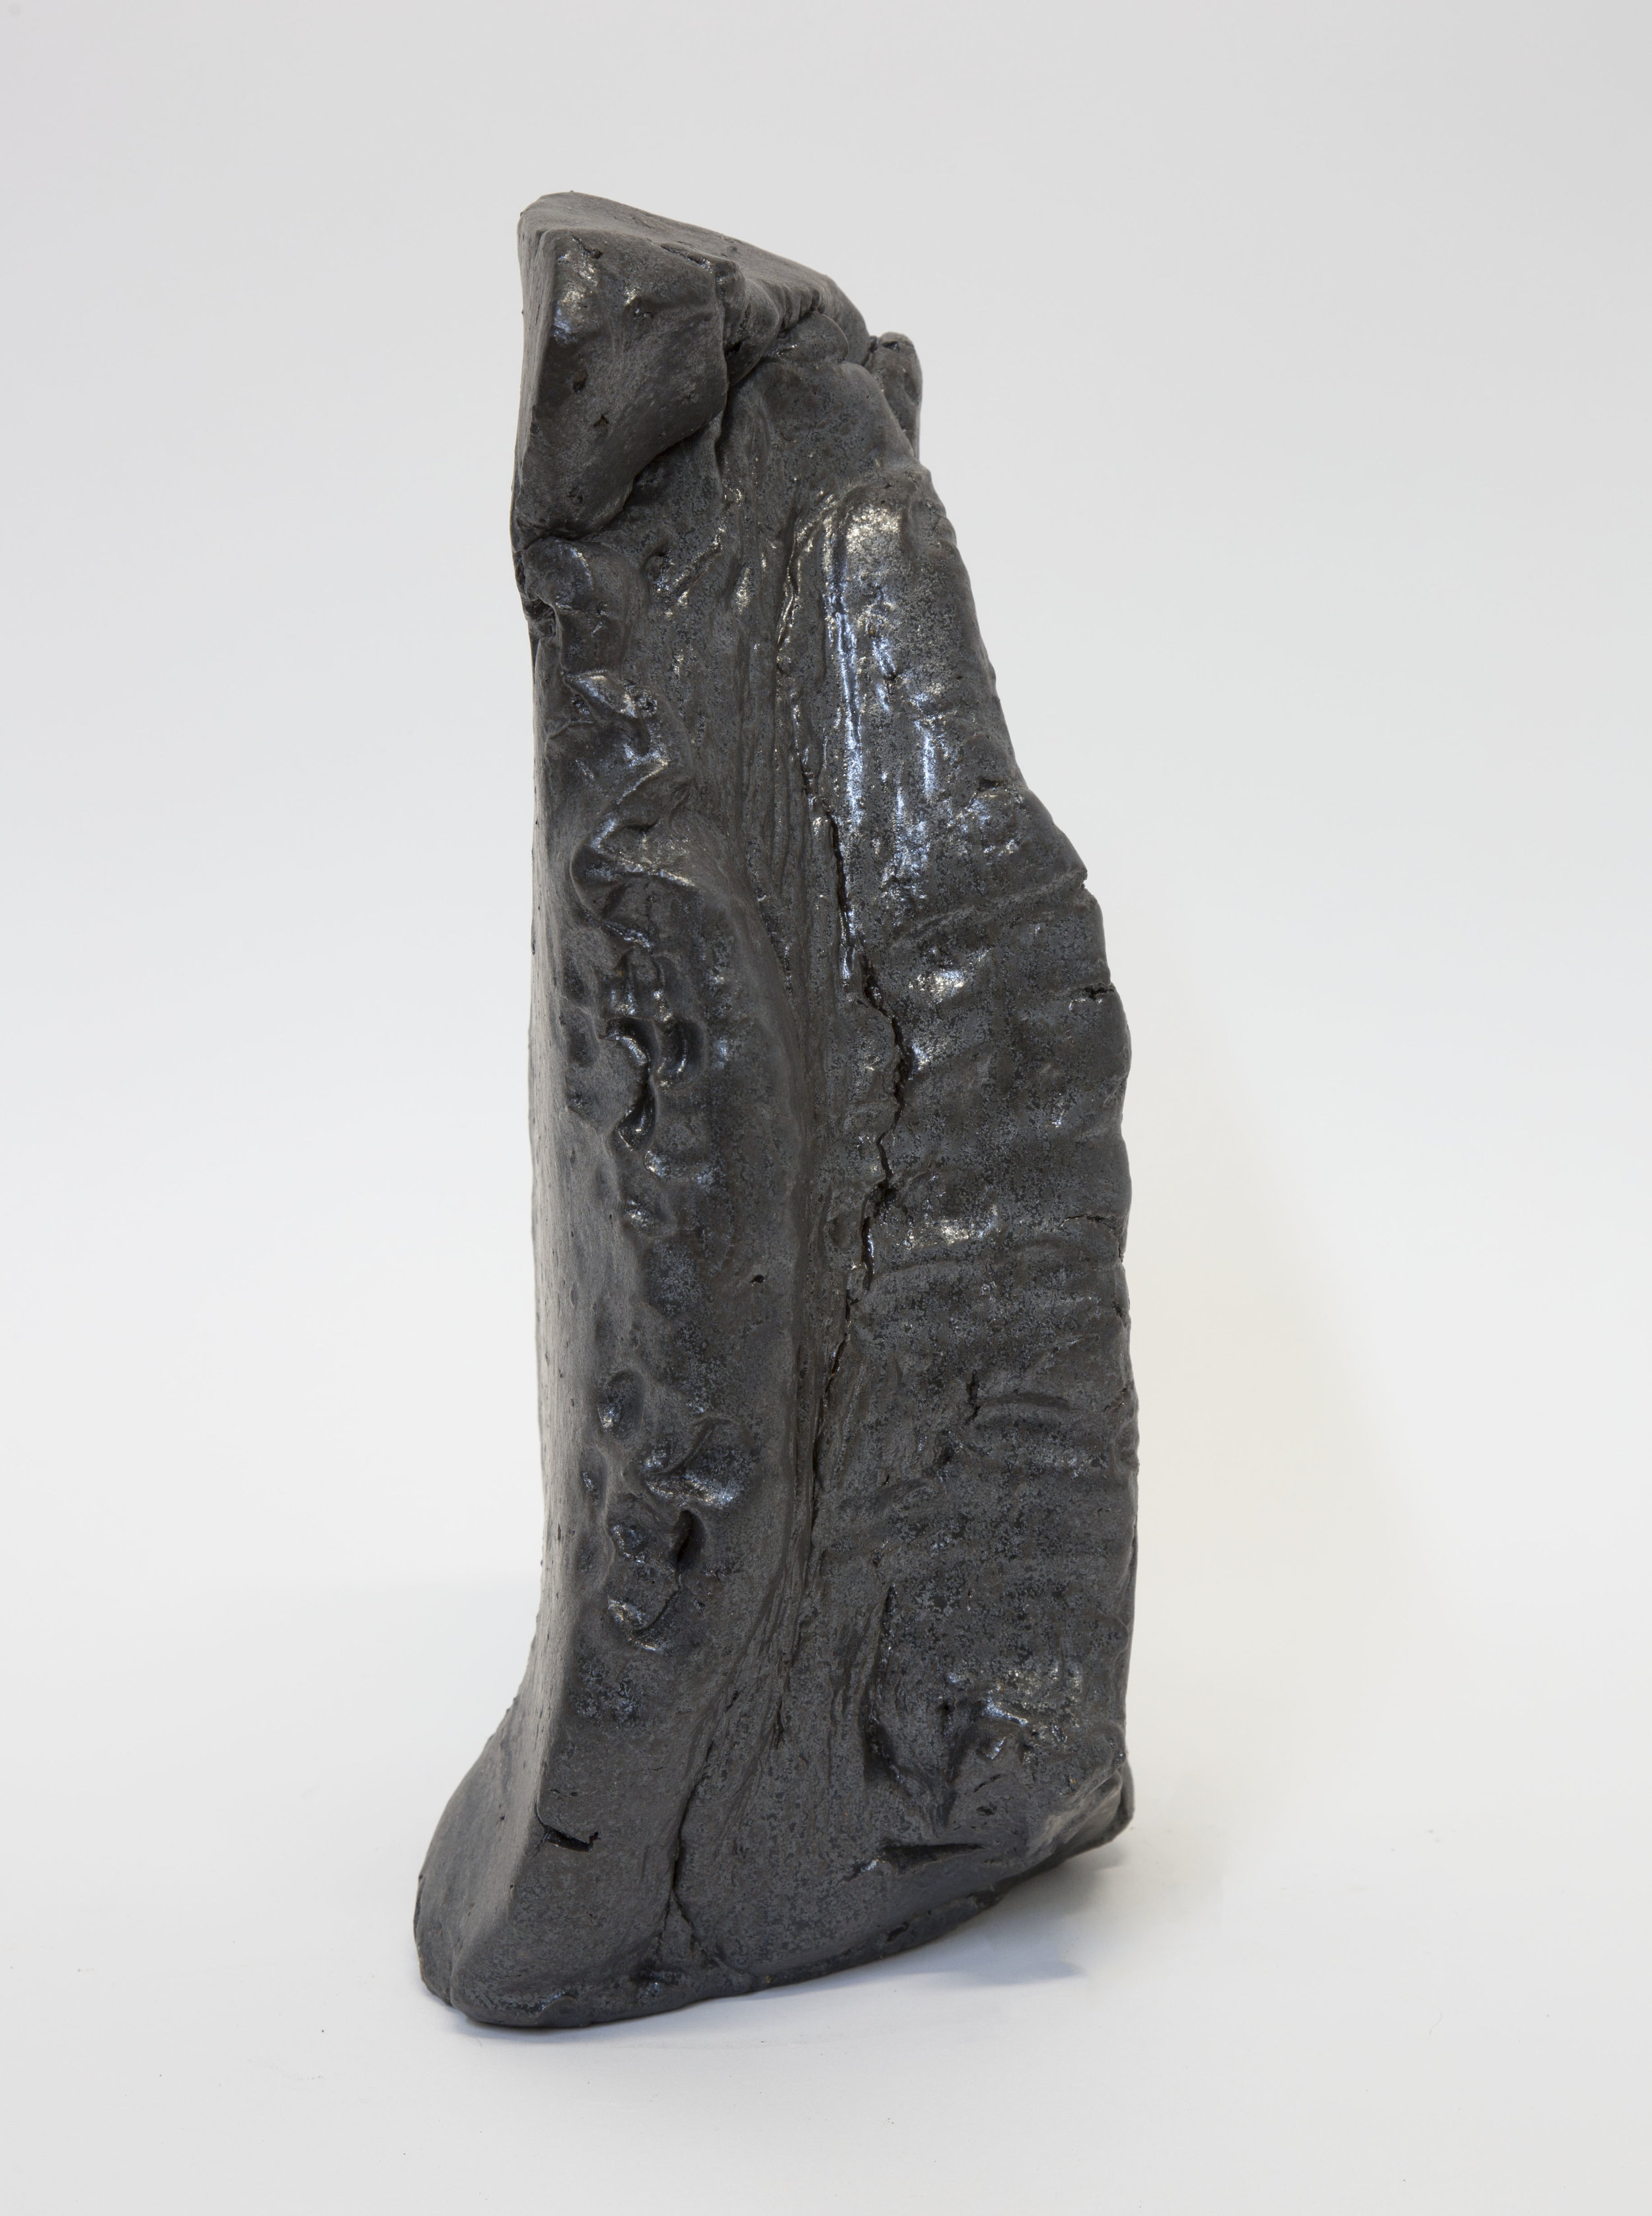 Sebastian Gladstone   Untitled Fired Stoneware , 2018 15 x 8 x 8 ½ in. fired stoneware, glaze